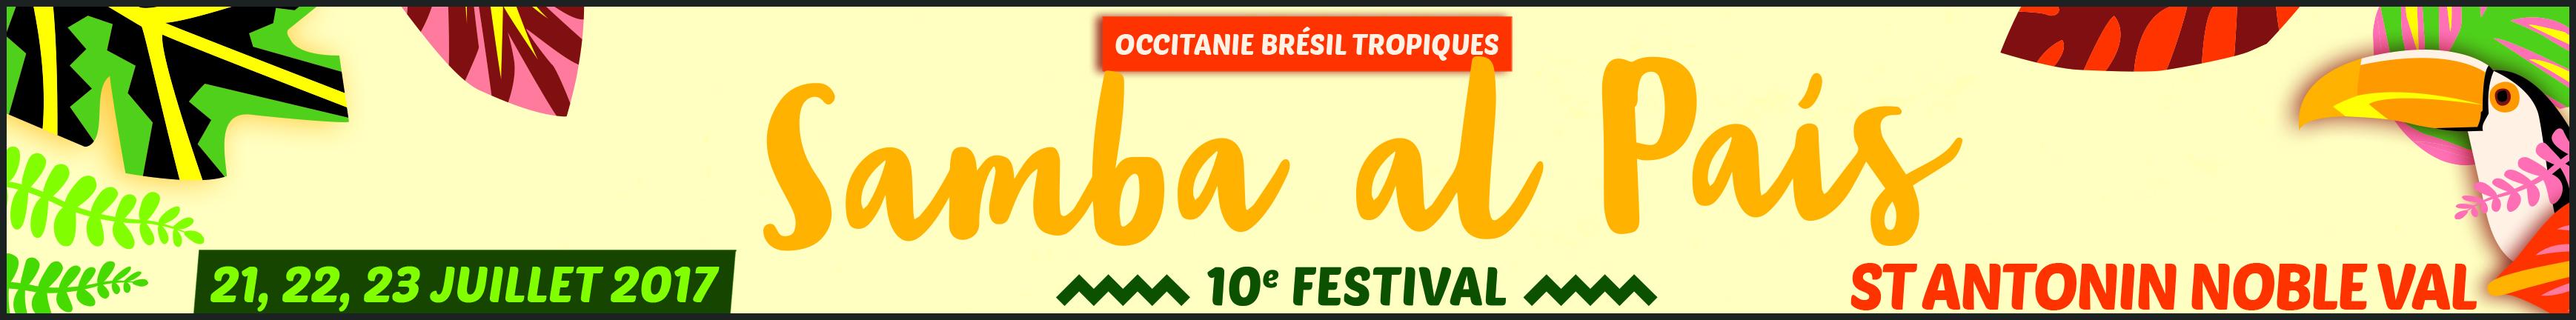 Festival Samba Al Pais